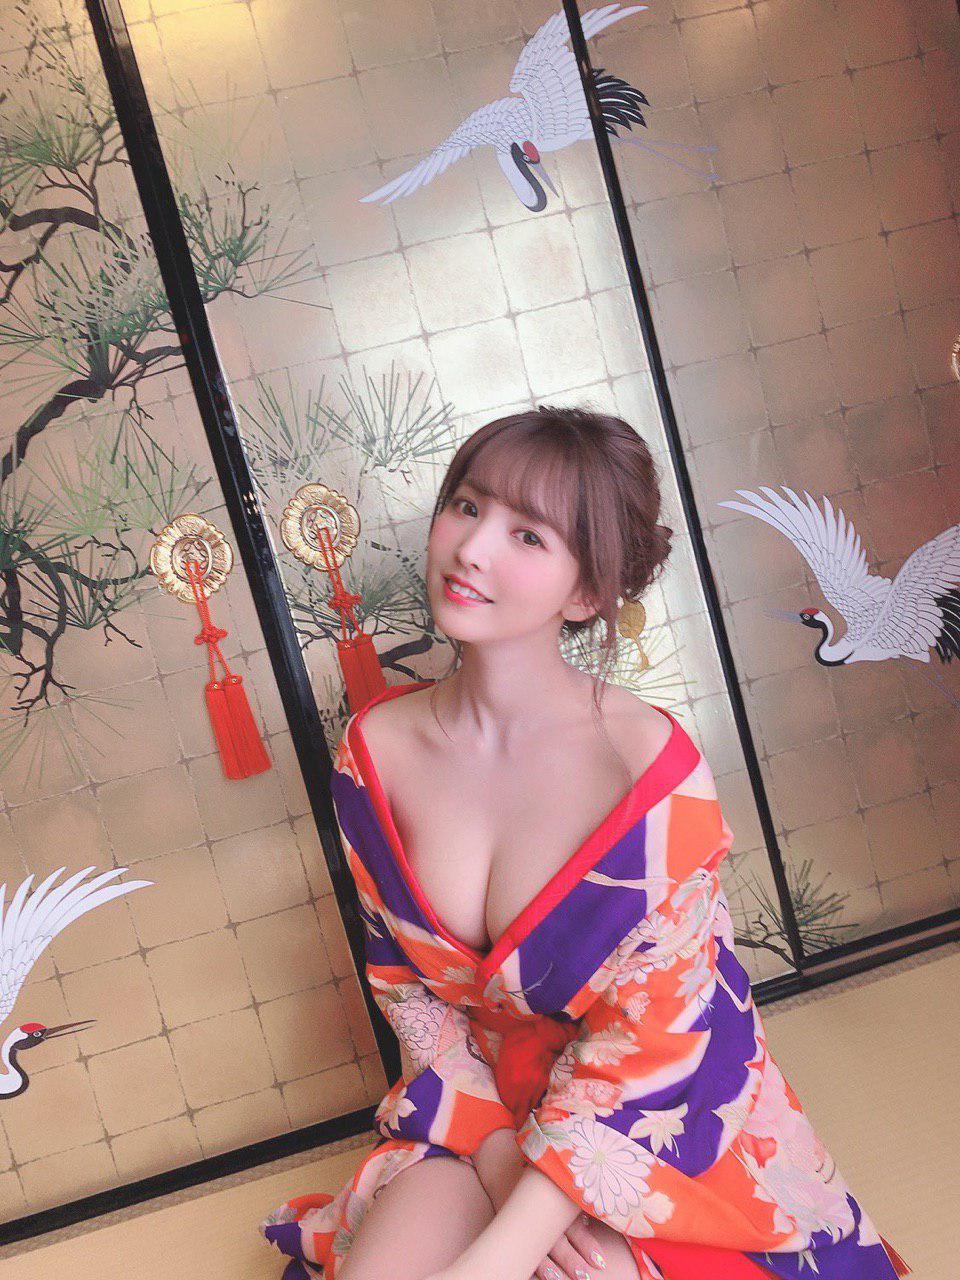 photo_2019-09-11_00-00-44.jpg